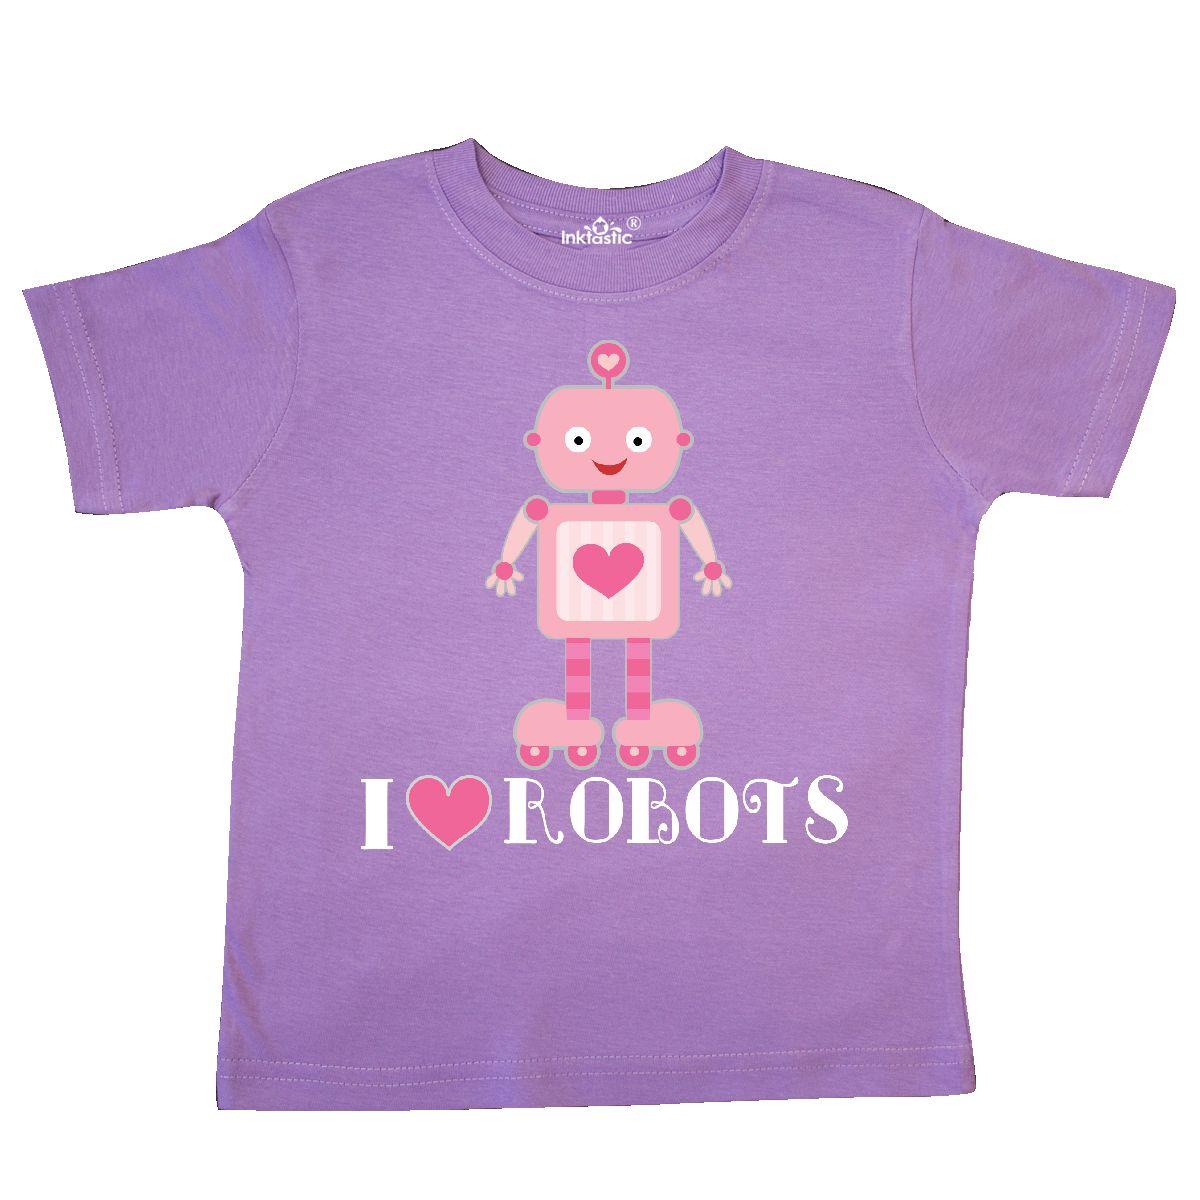 Inktastic-Robotics-I-Love-Robots-Girls-Toddler-T-Shirt-Heart-Childs-Gift-Lover thumbnail 3